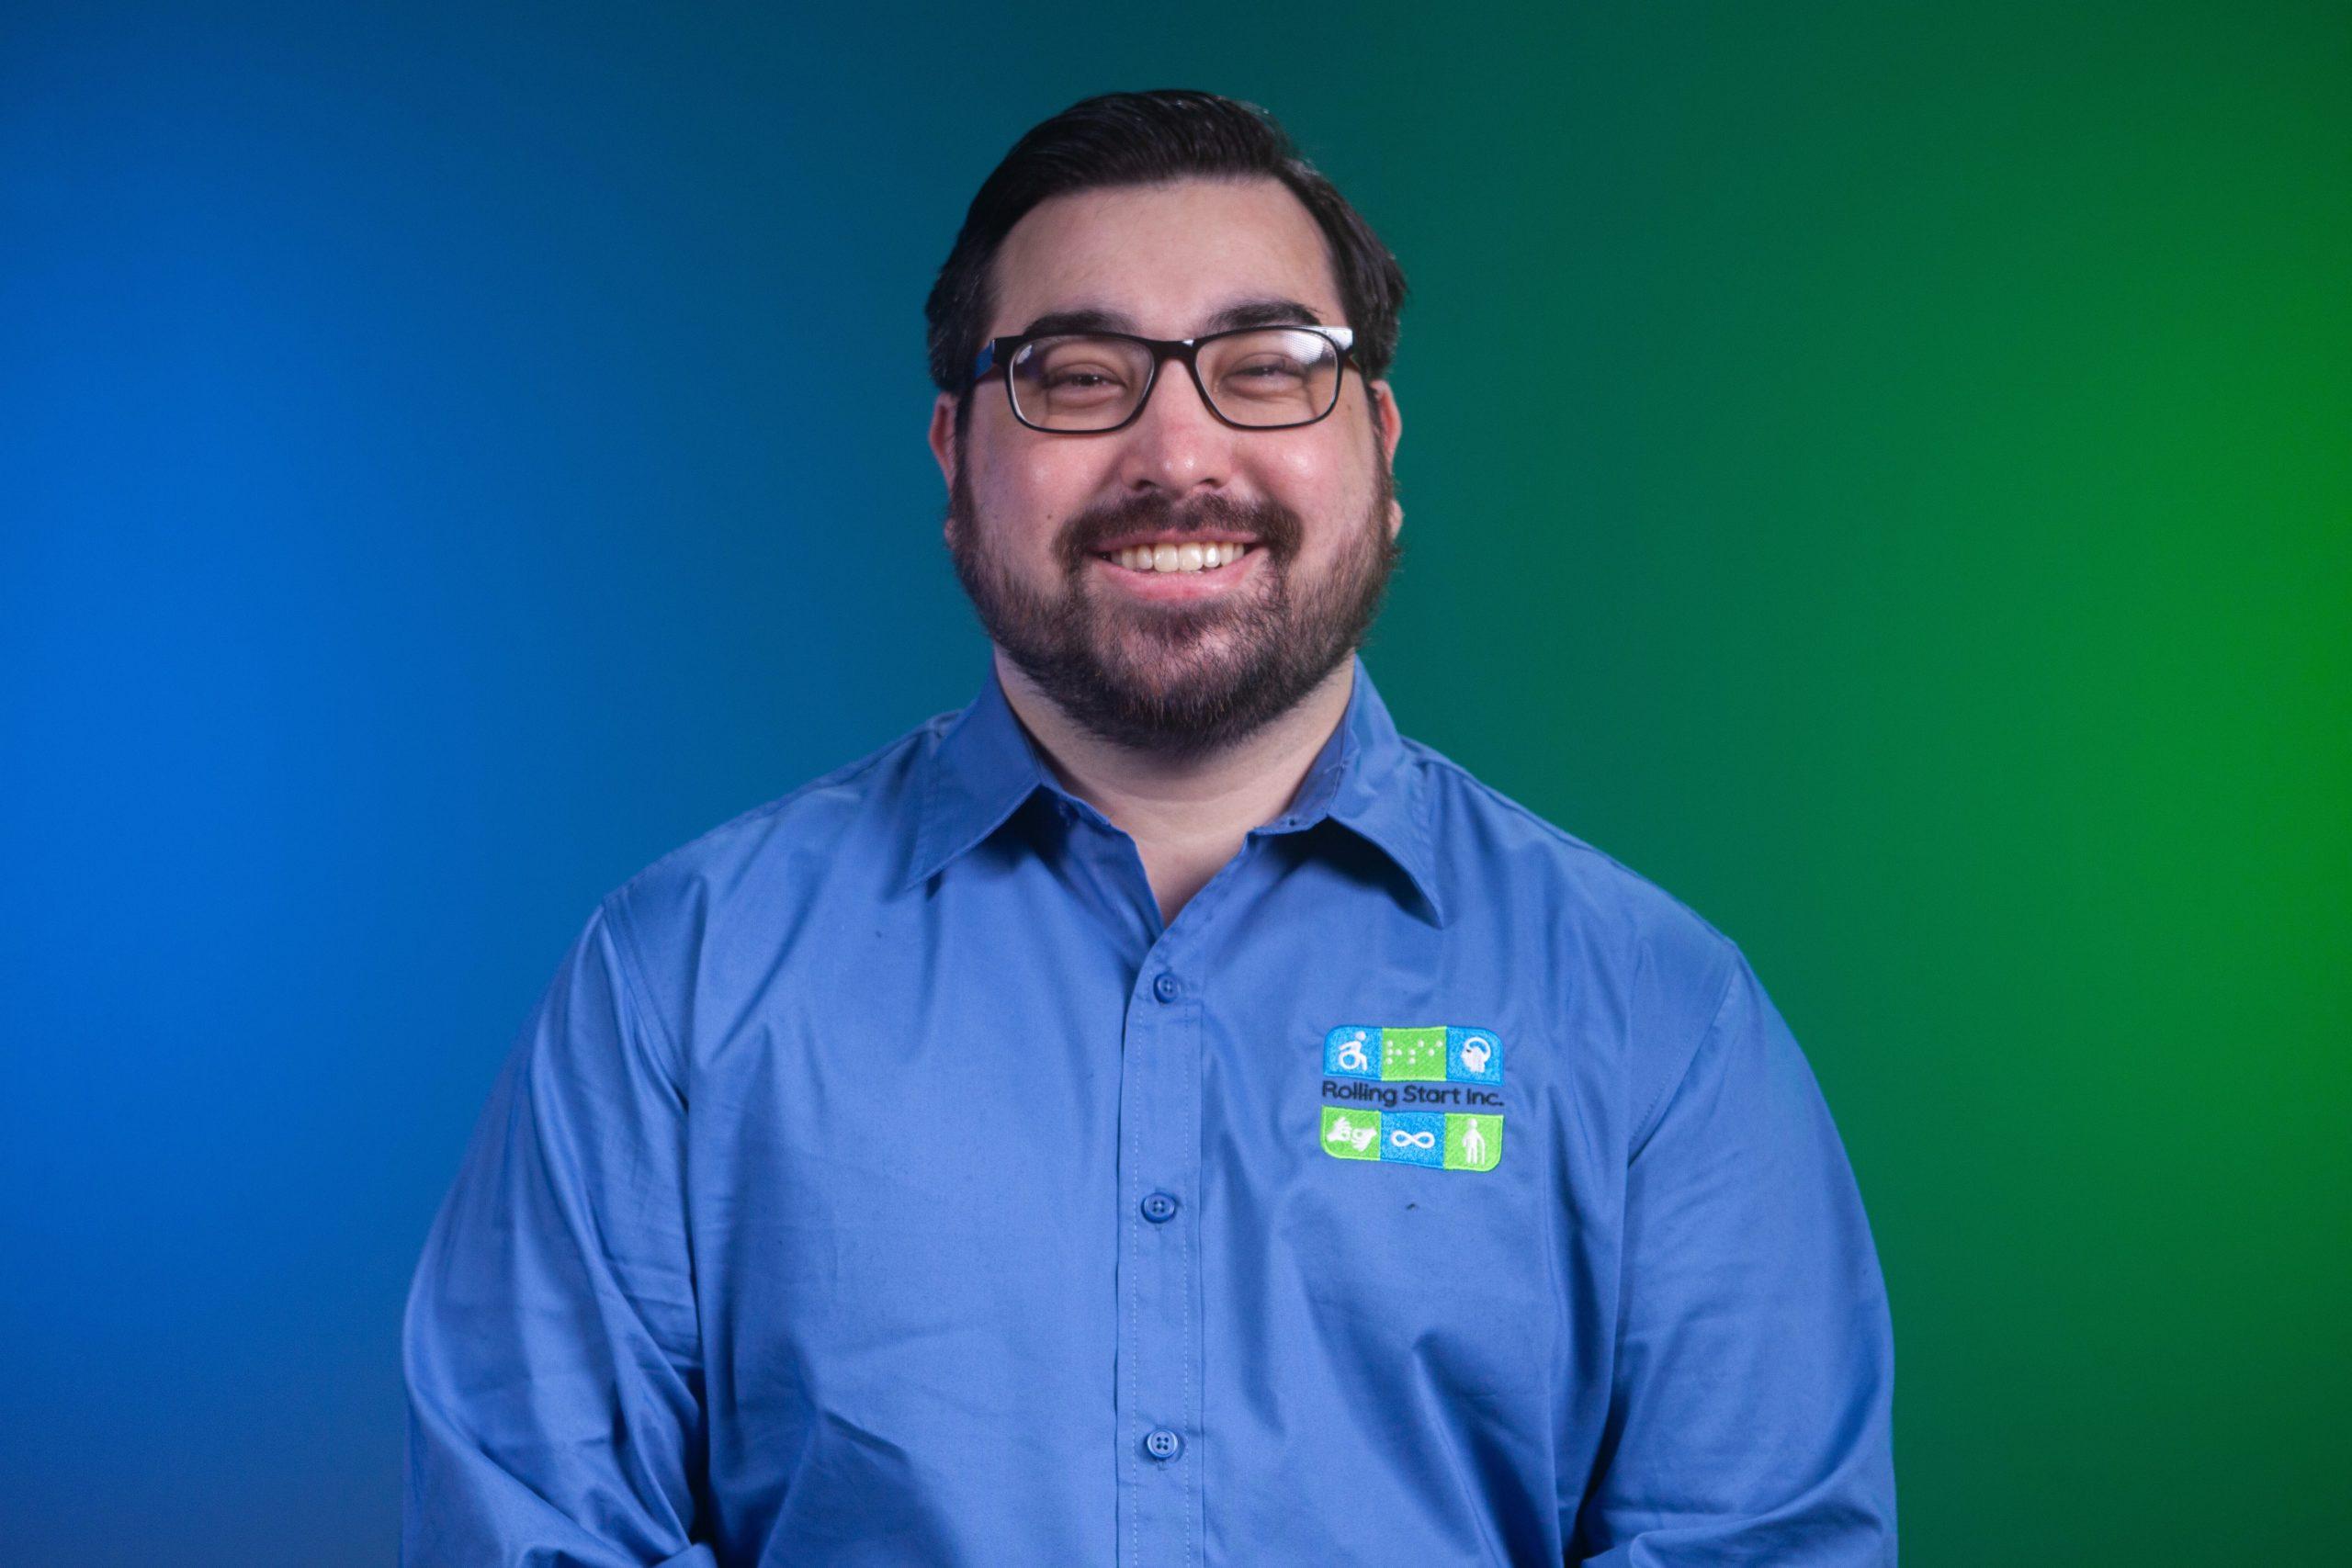 Nathan Altis - Employment Services Coordinator